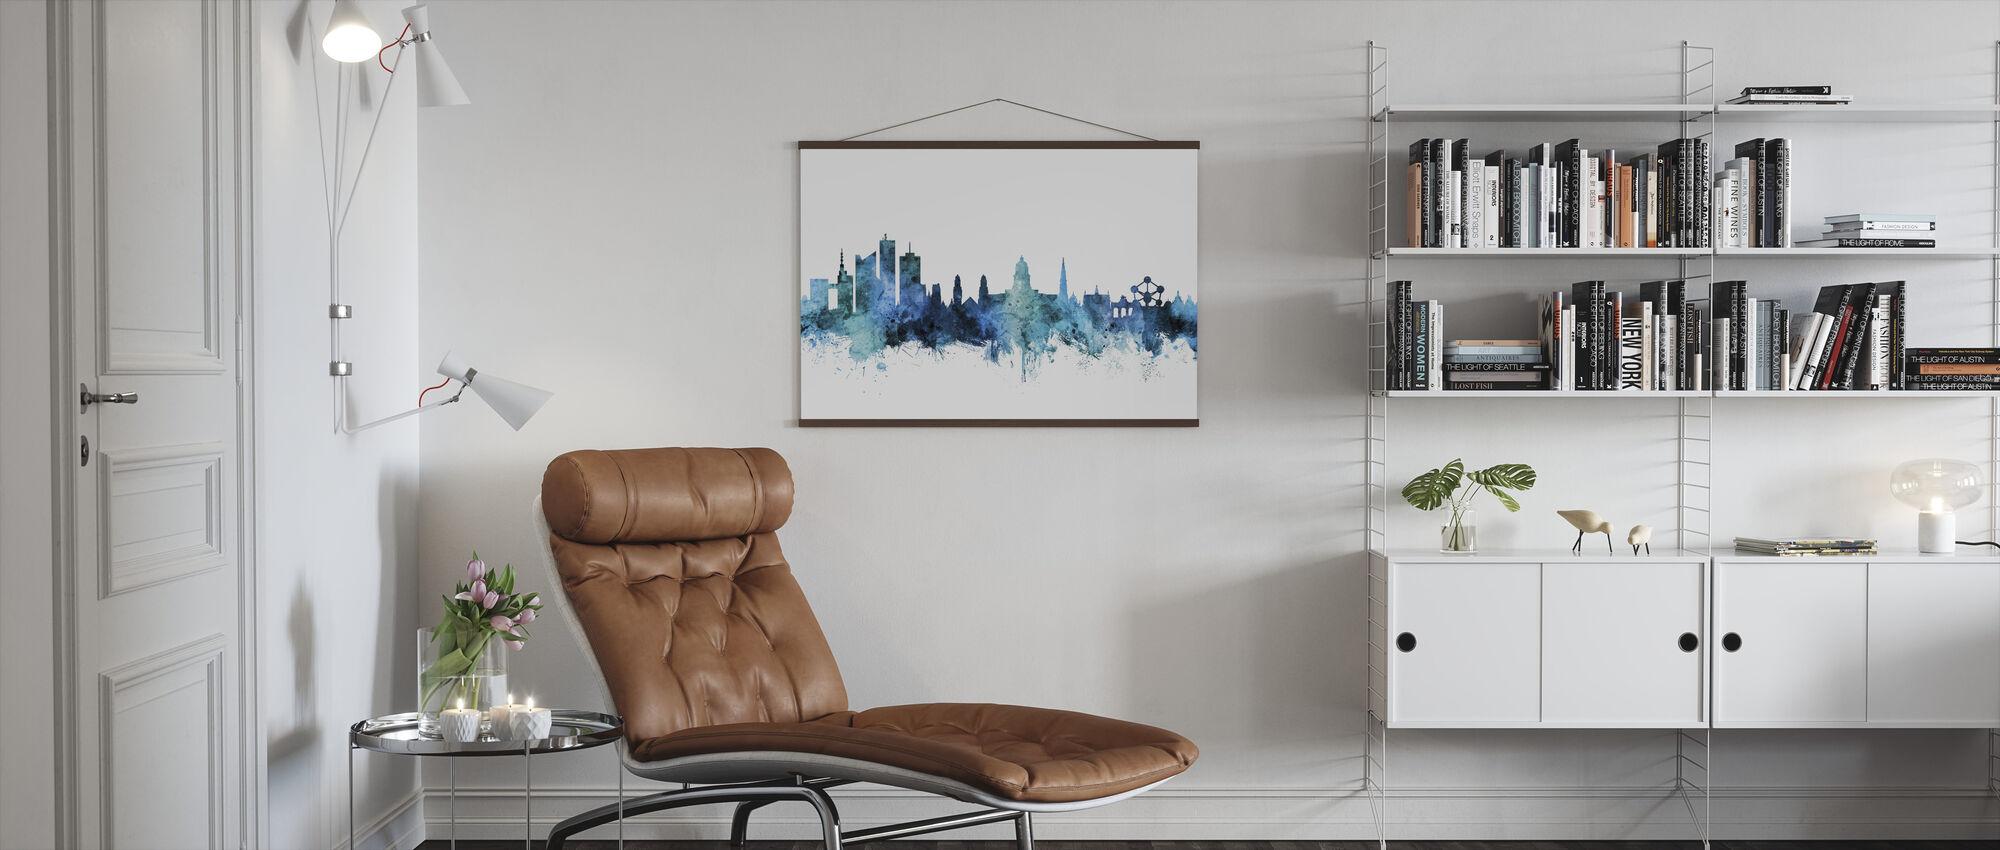 Brussels Belgium Skyline - Poster - Living Room